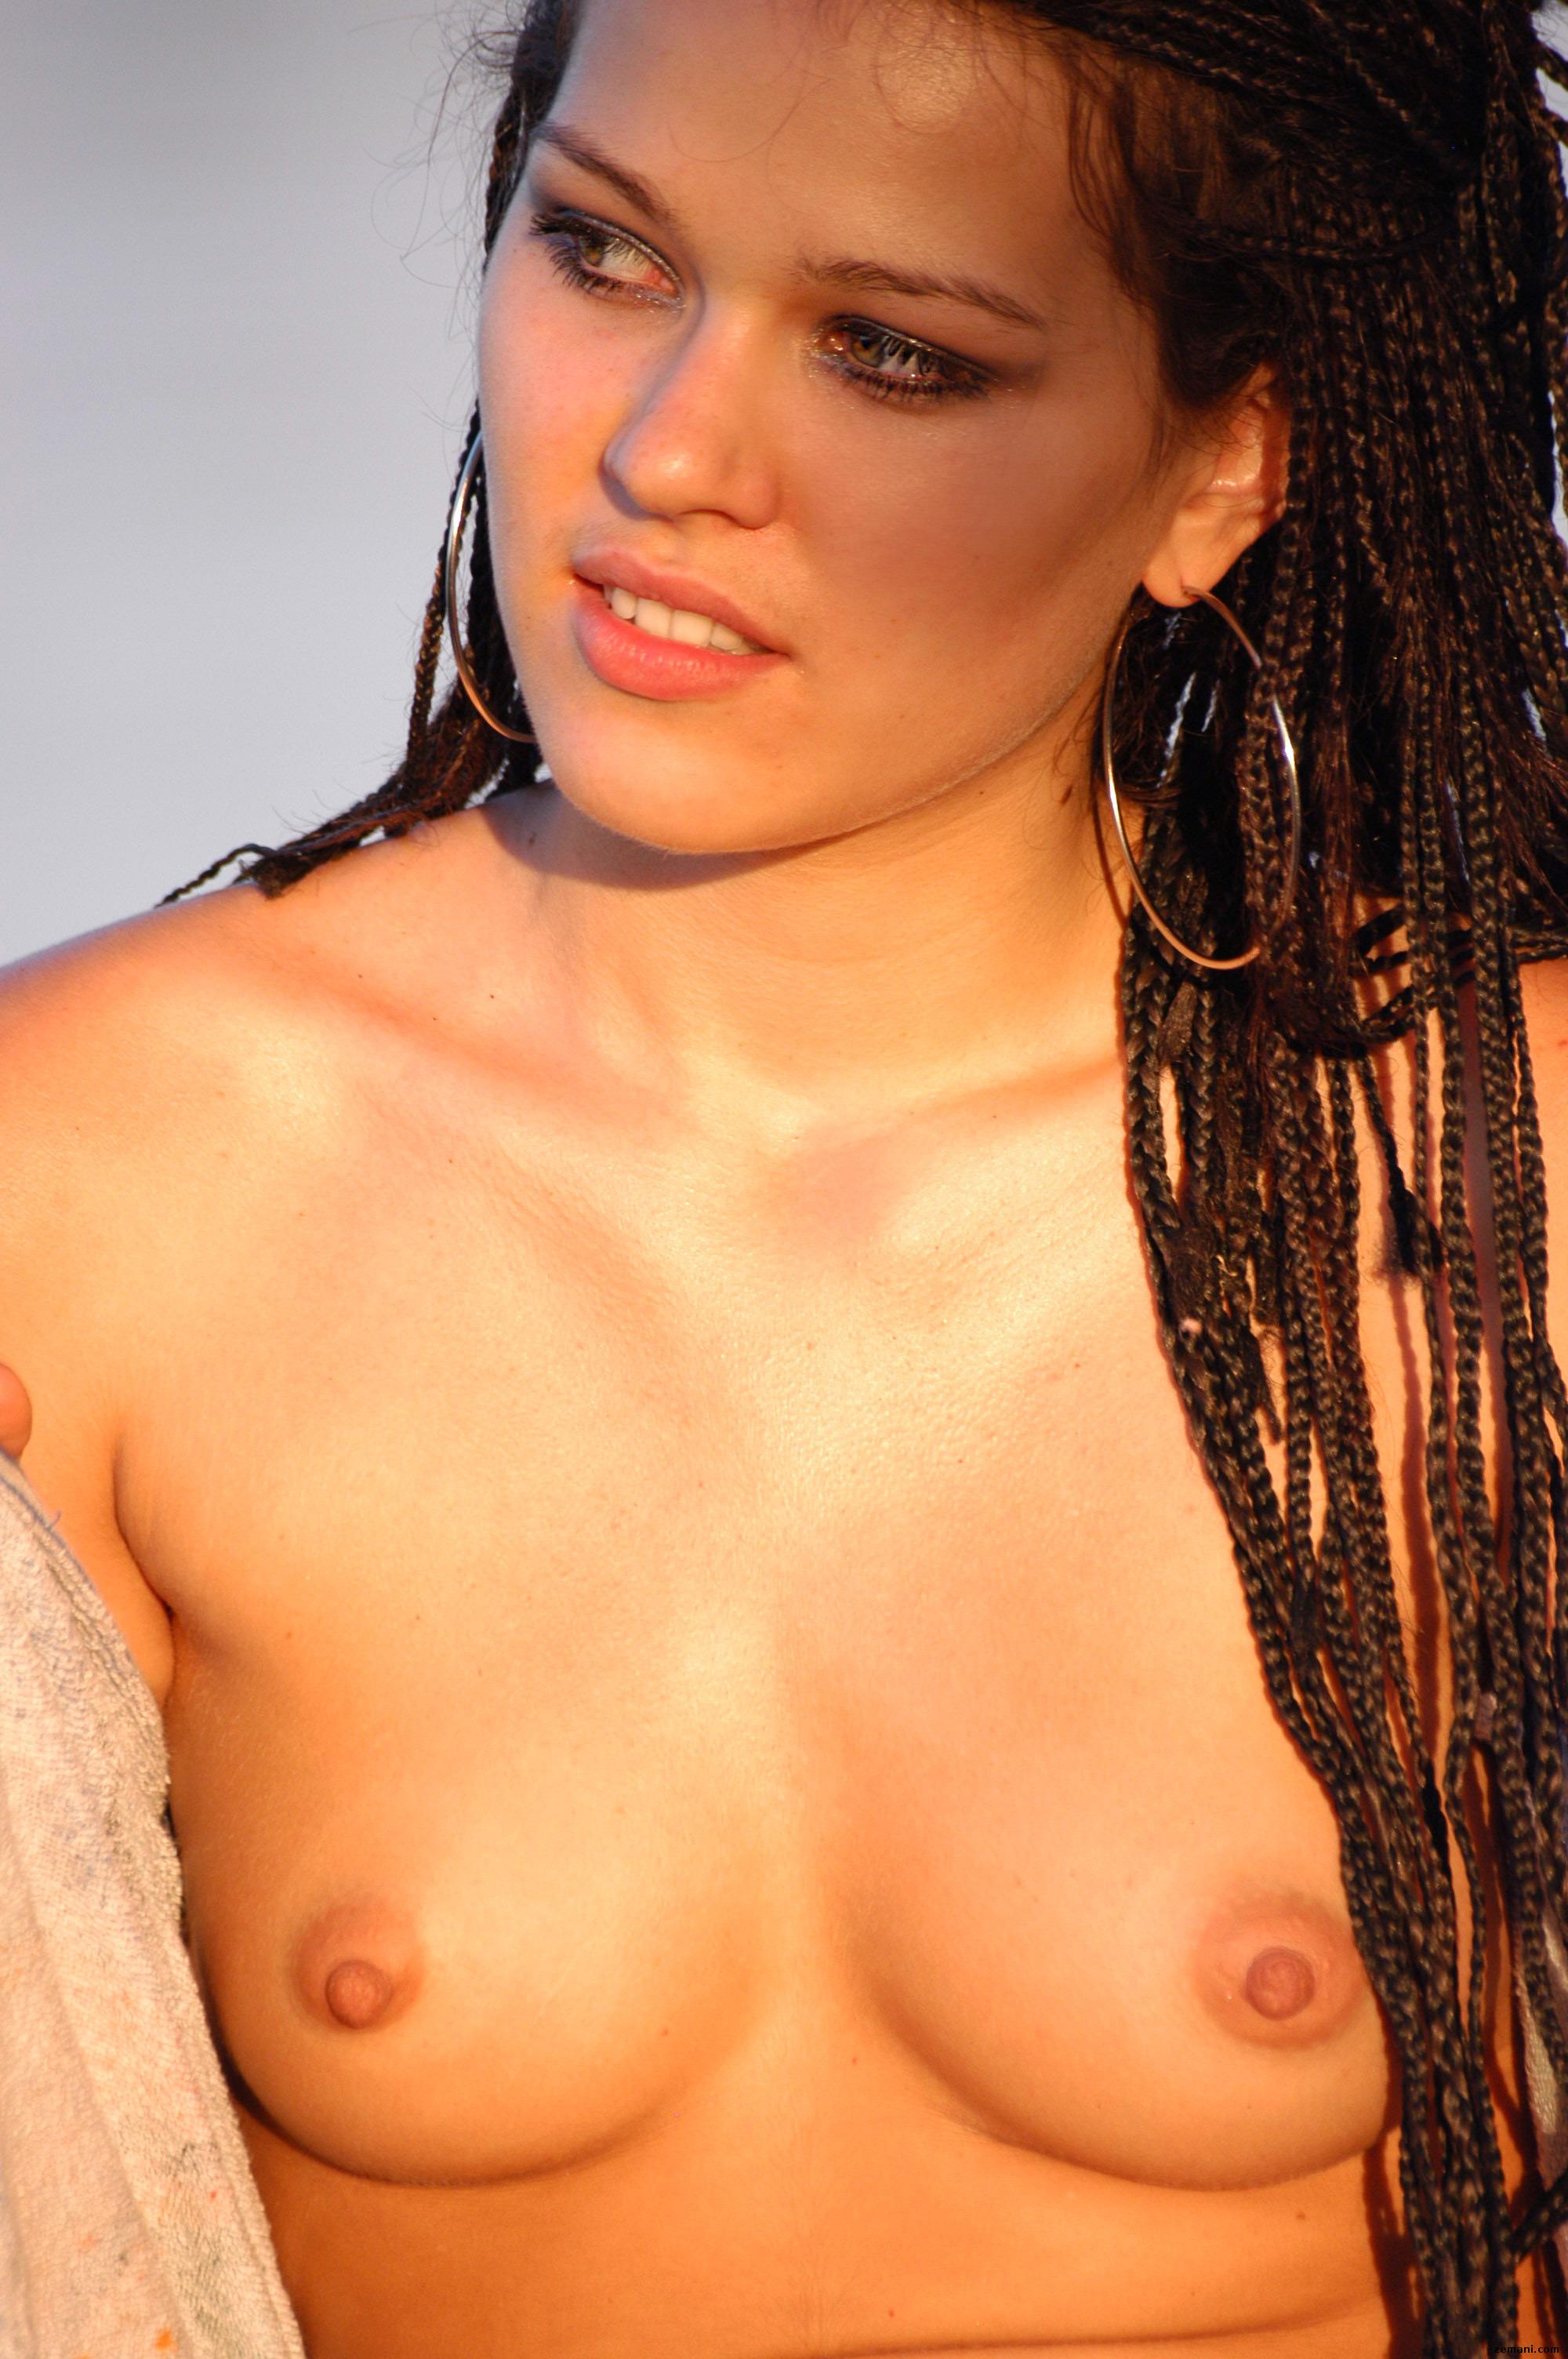 amateur video erotik 123 videos